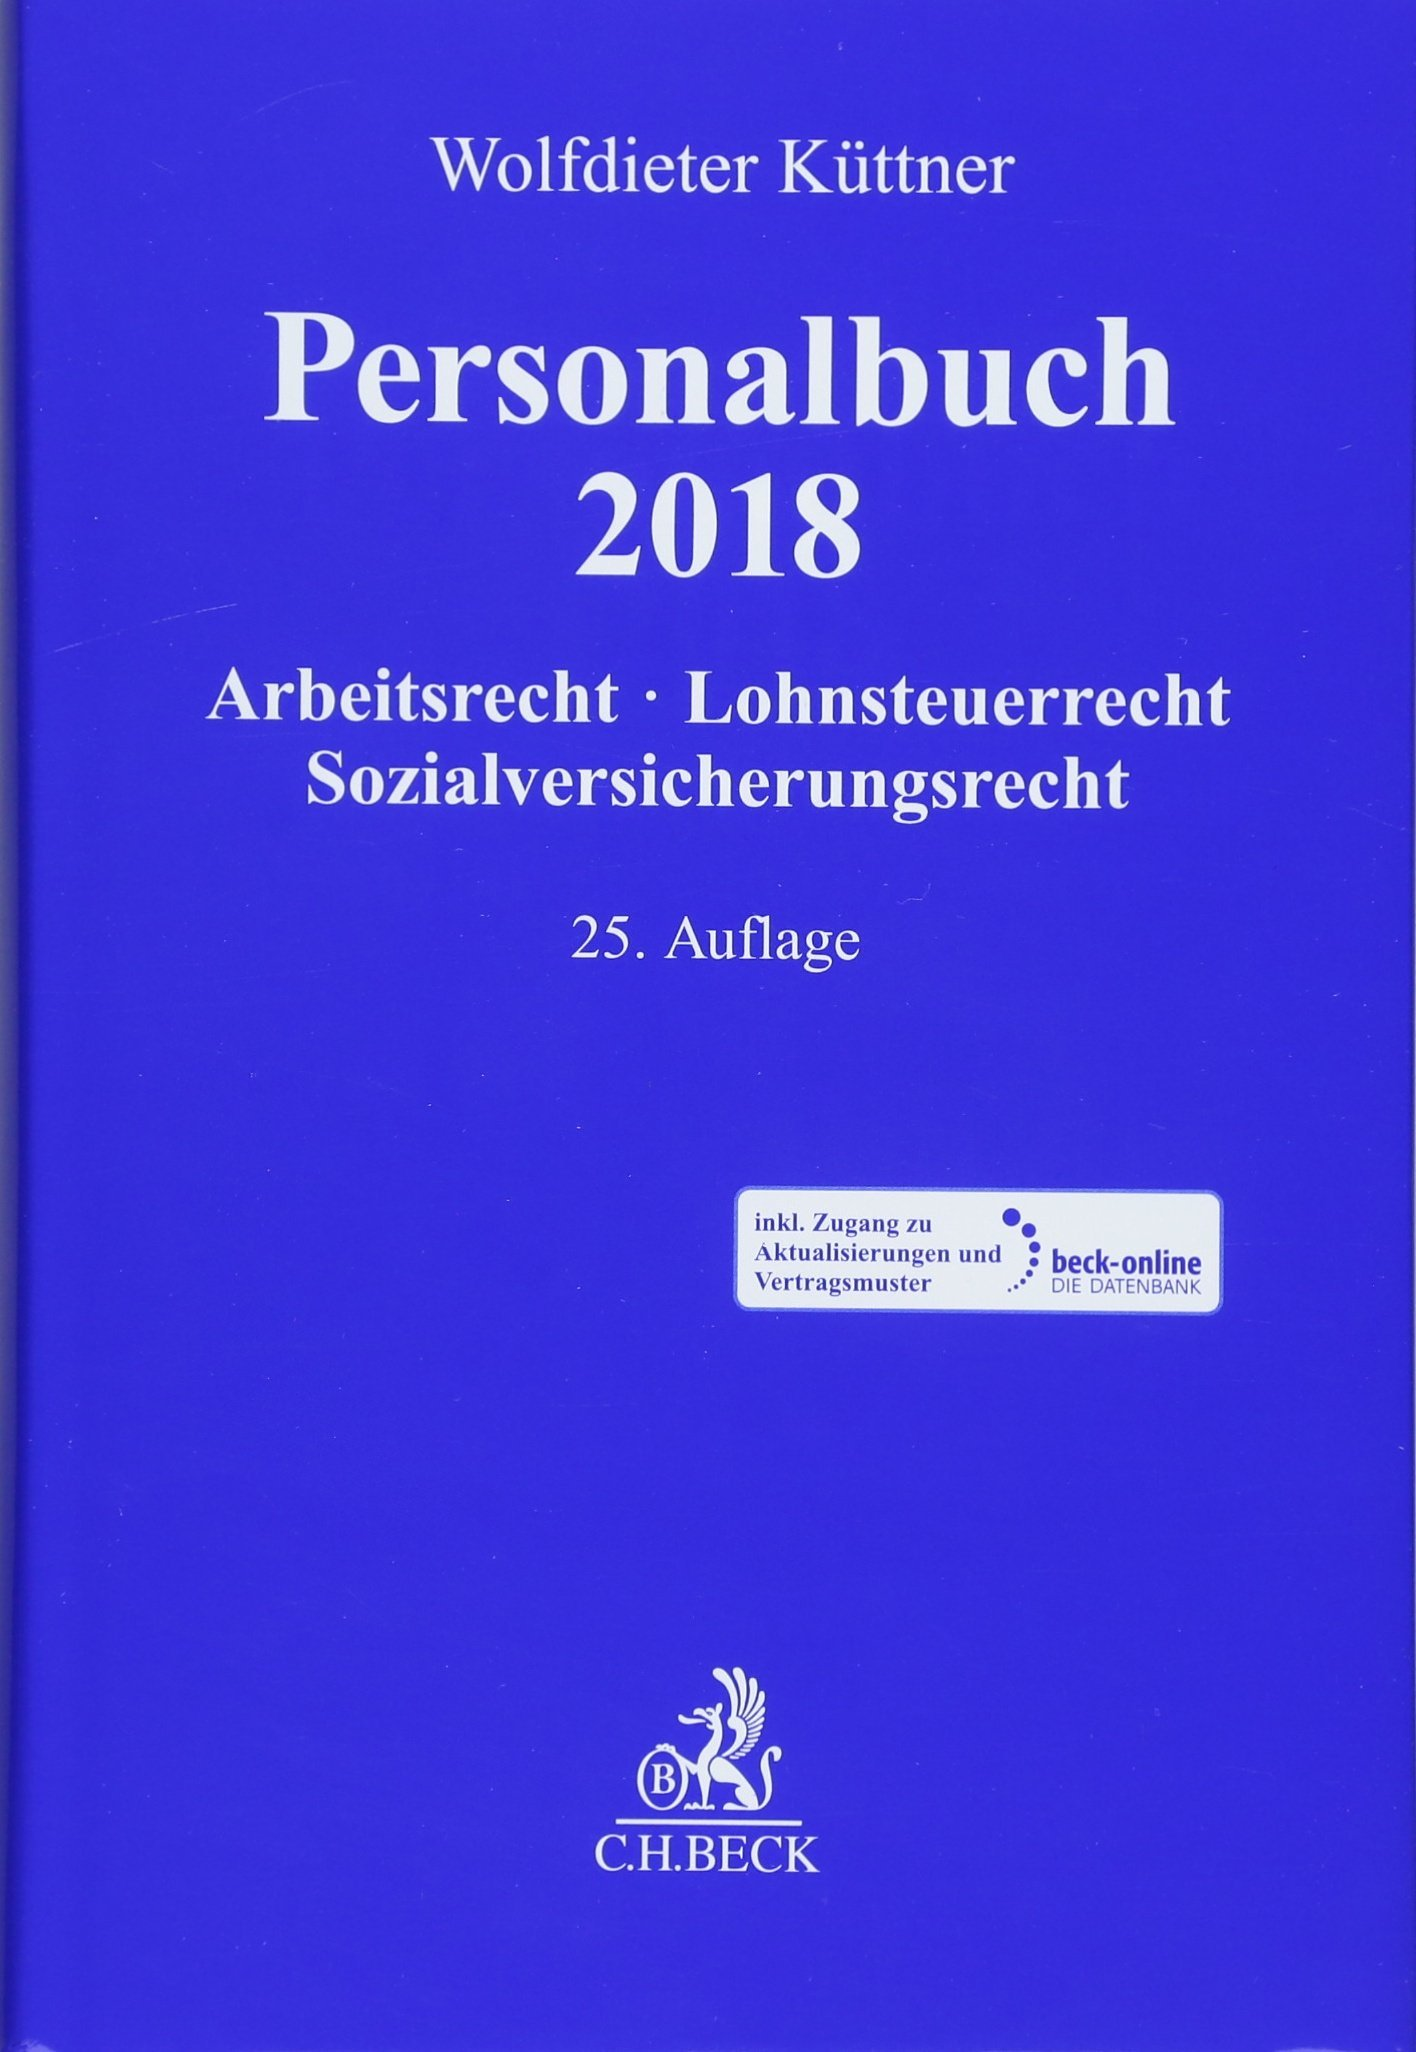 Personalbuch 2018 Arbeitsrecht Lohnsteuerrecht Jürgen Röller